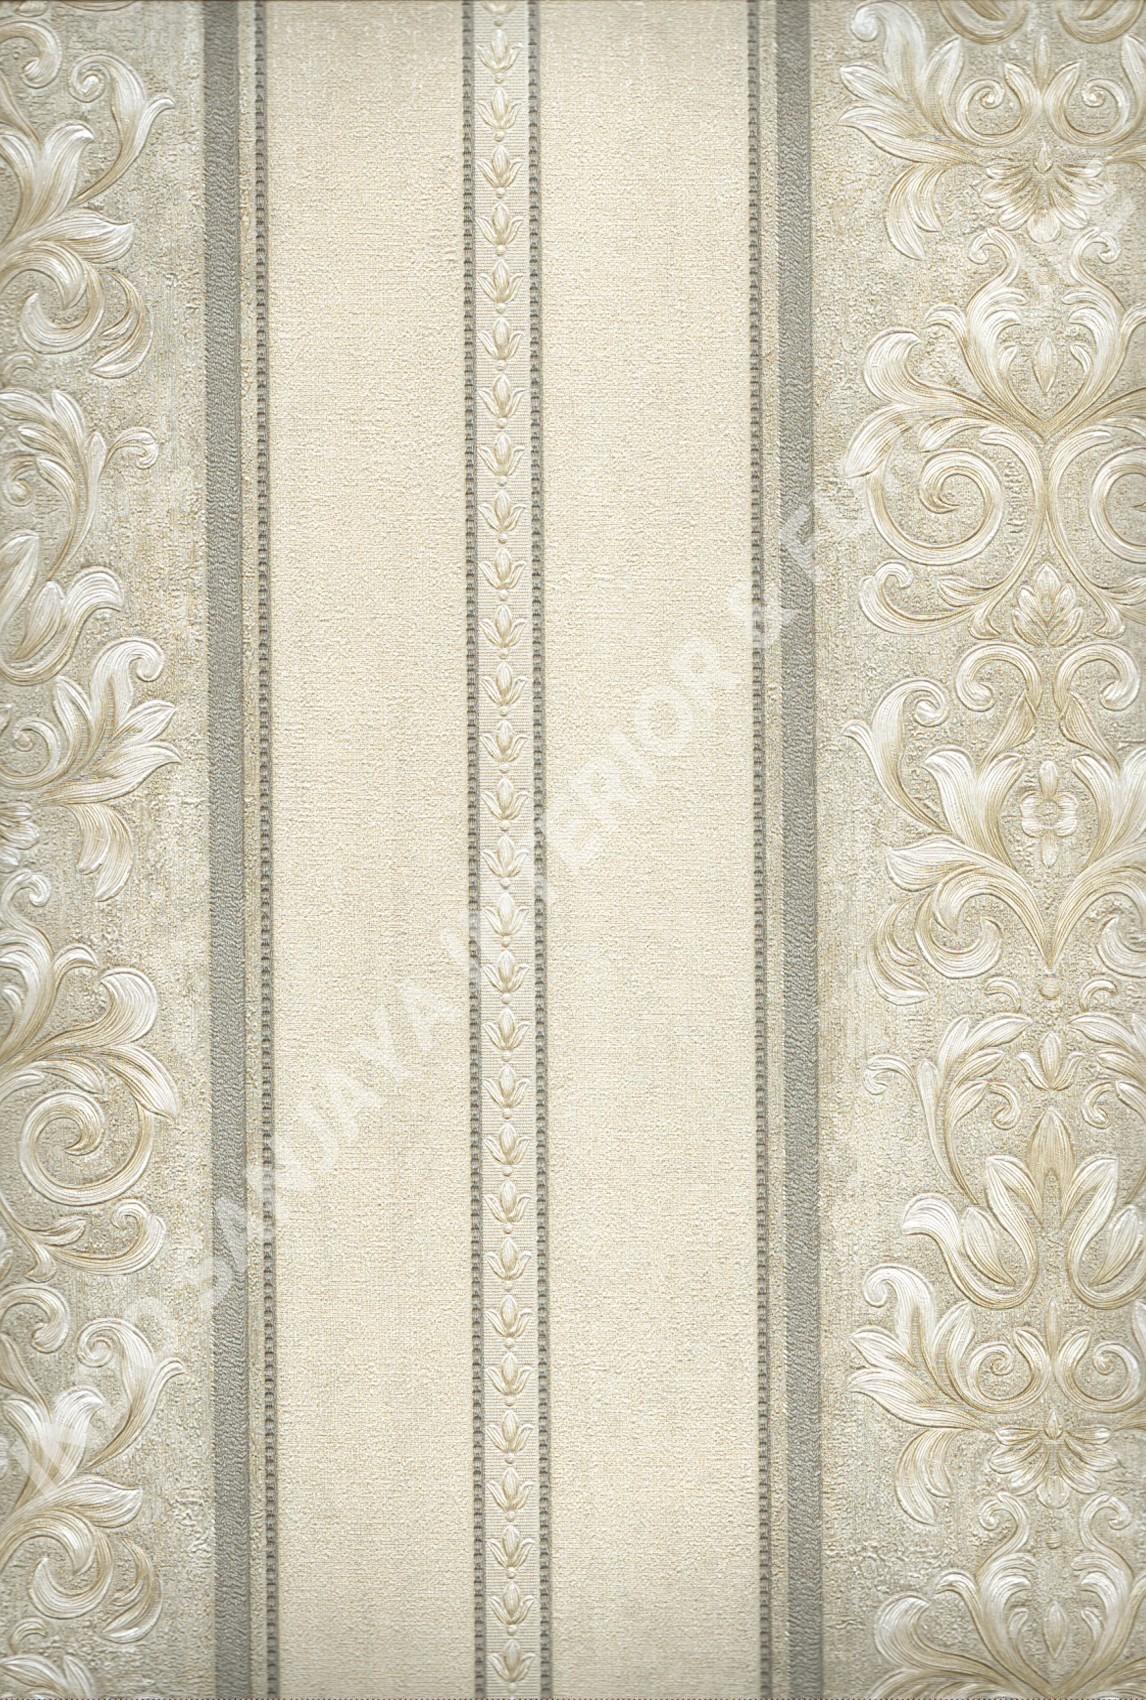 wallpaper   Wallpaper Klasik Batik (Damask) YG80601:YG80601 corak  warna